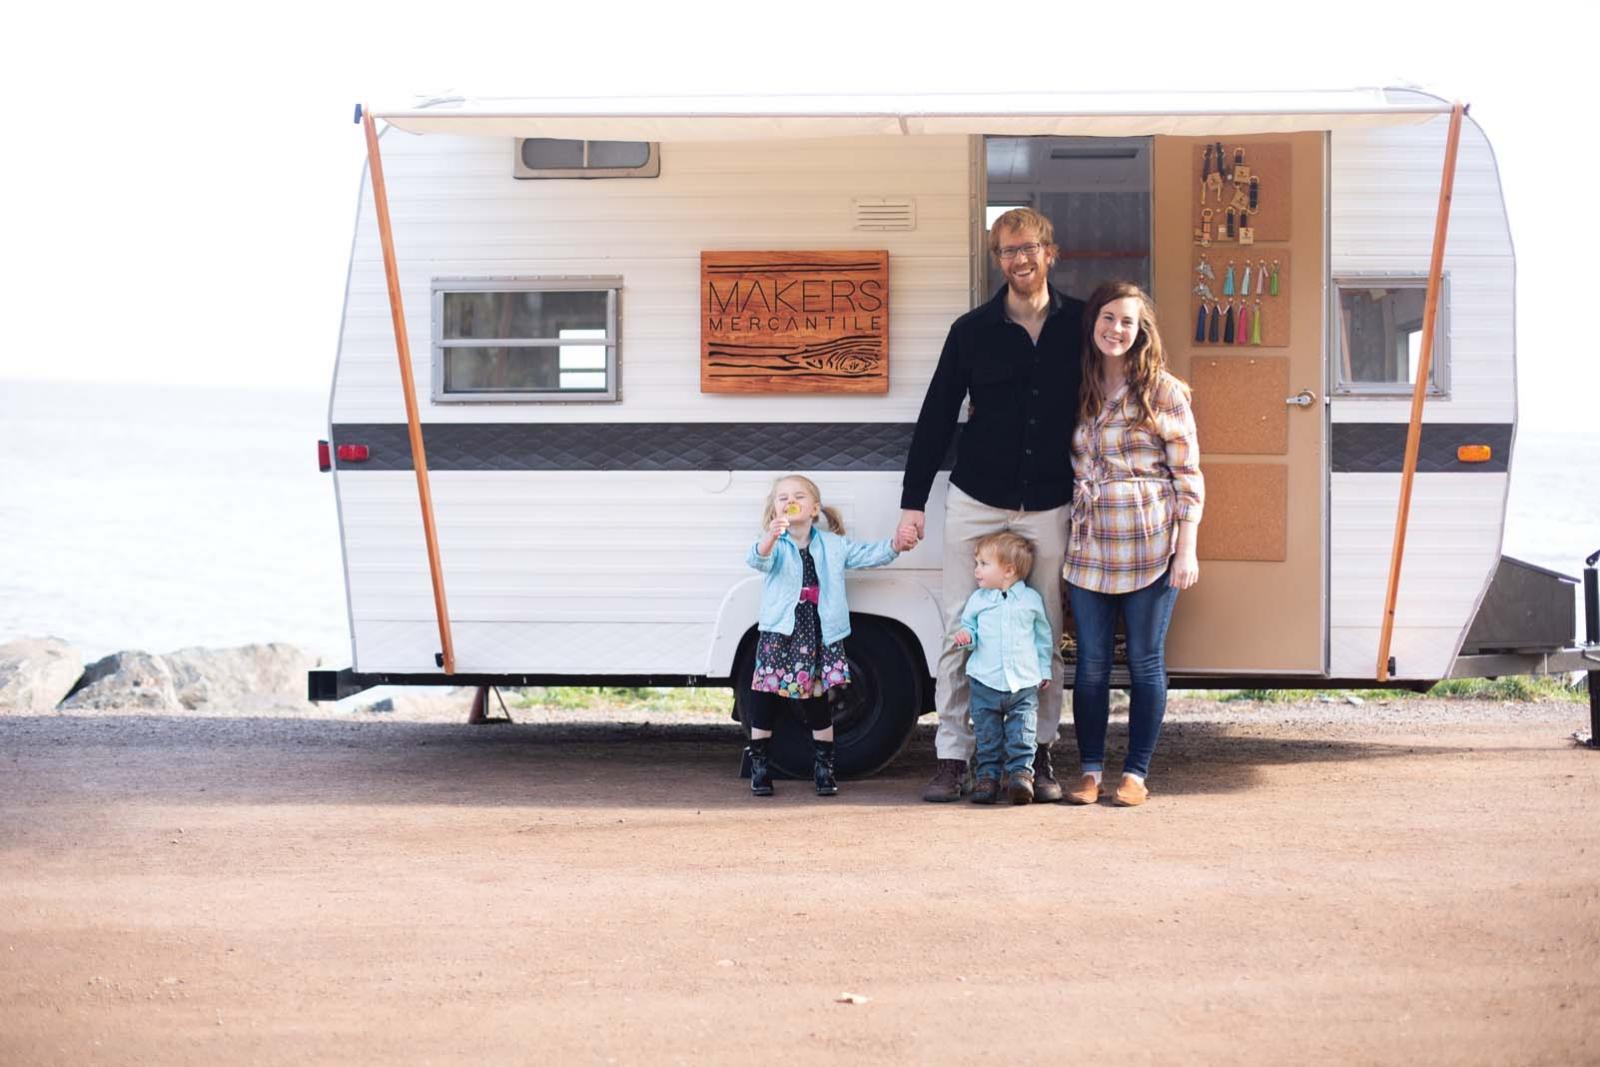 Makers Mercantile proprietors Sara and Scott Clifton outside a camper.